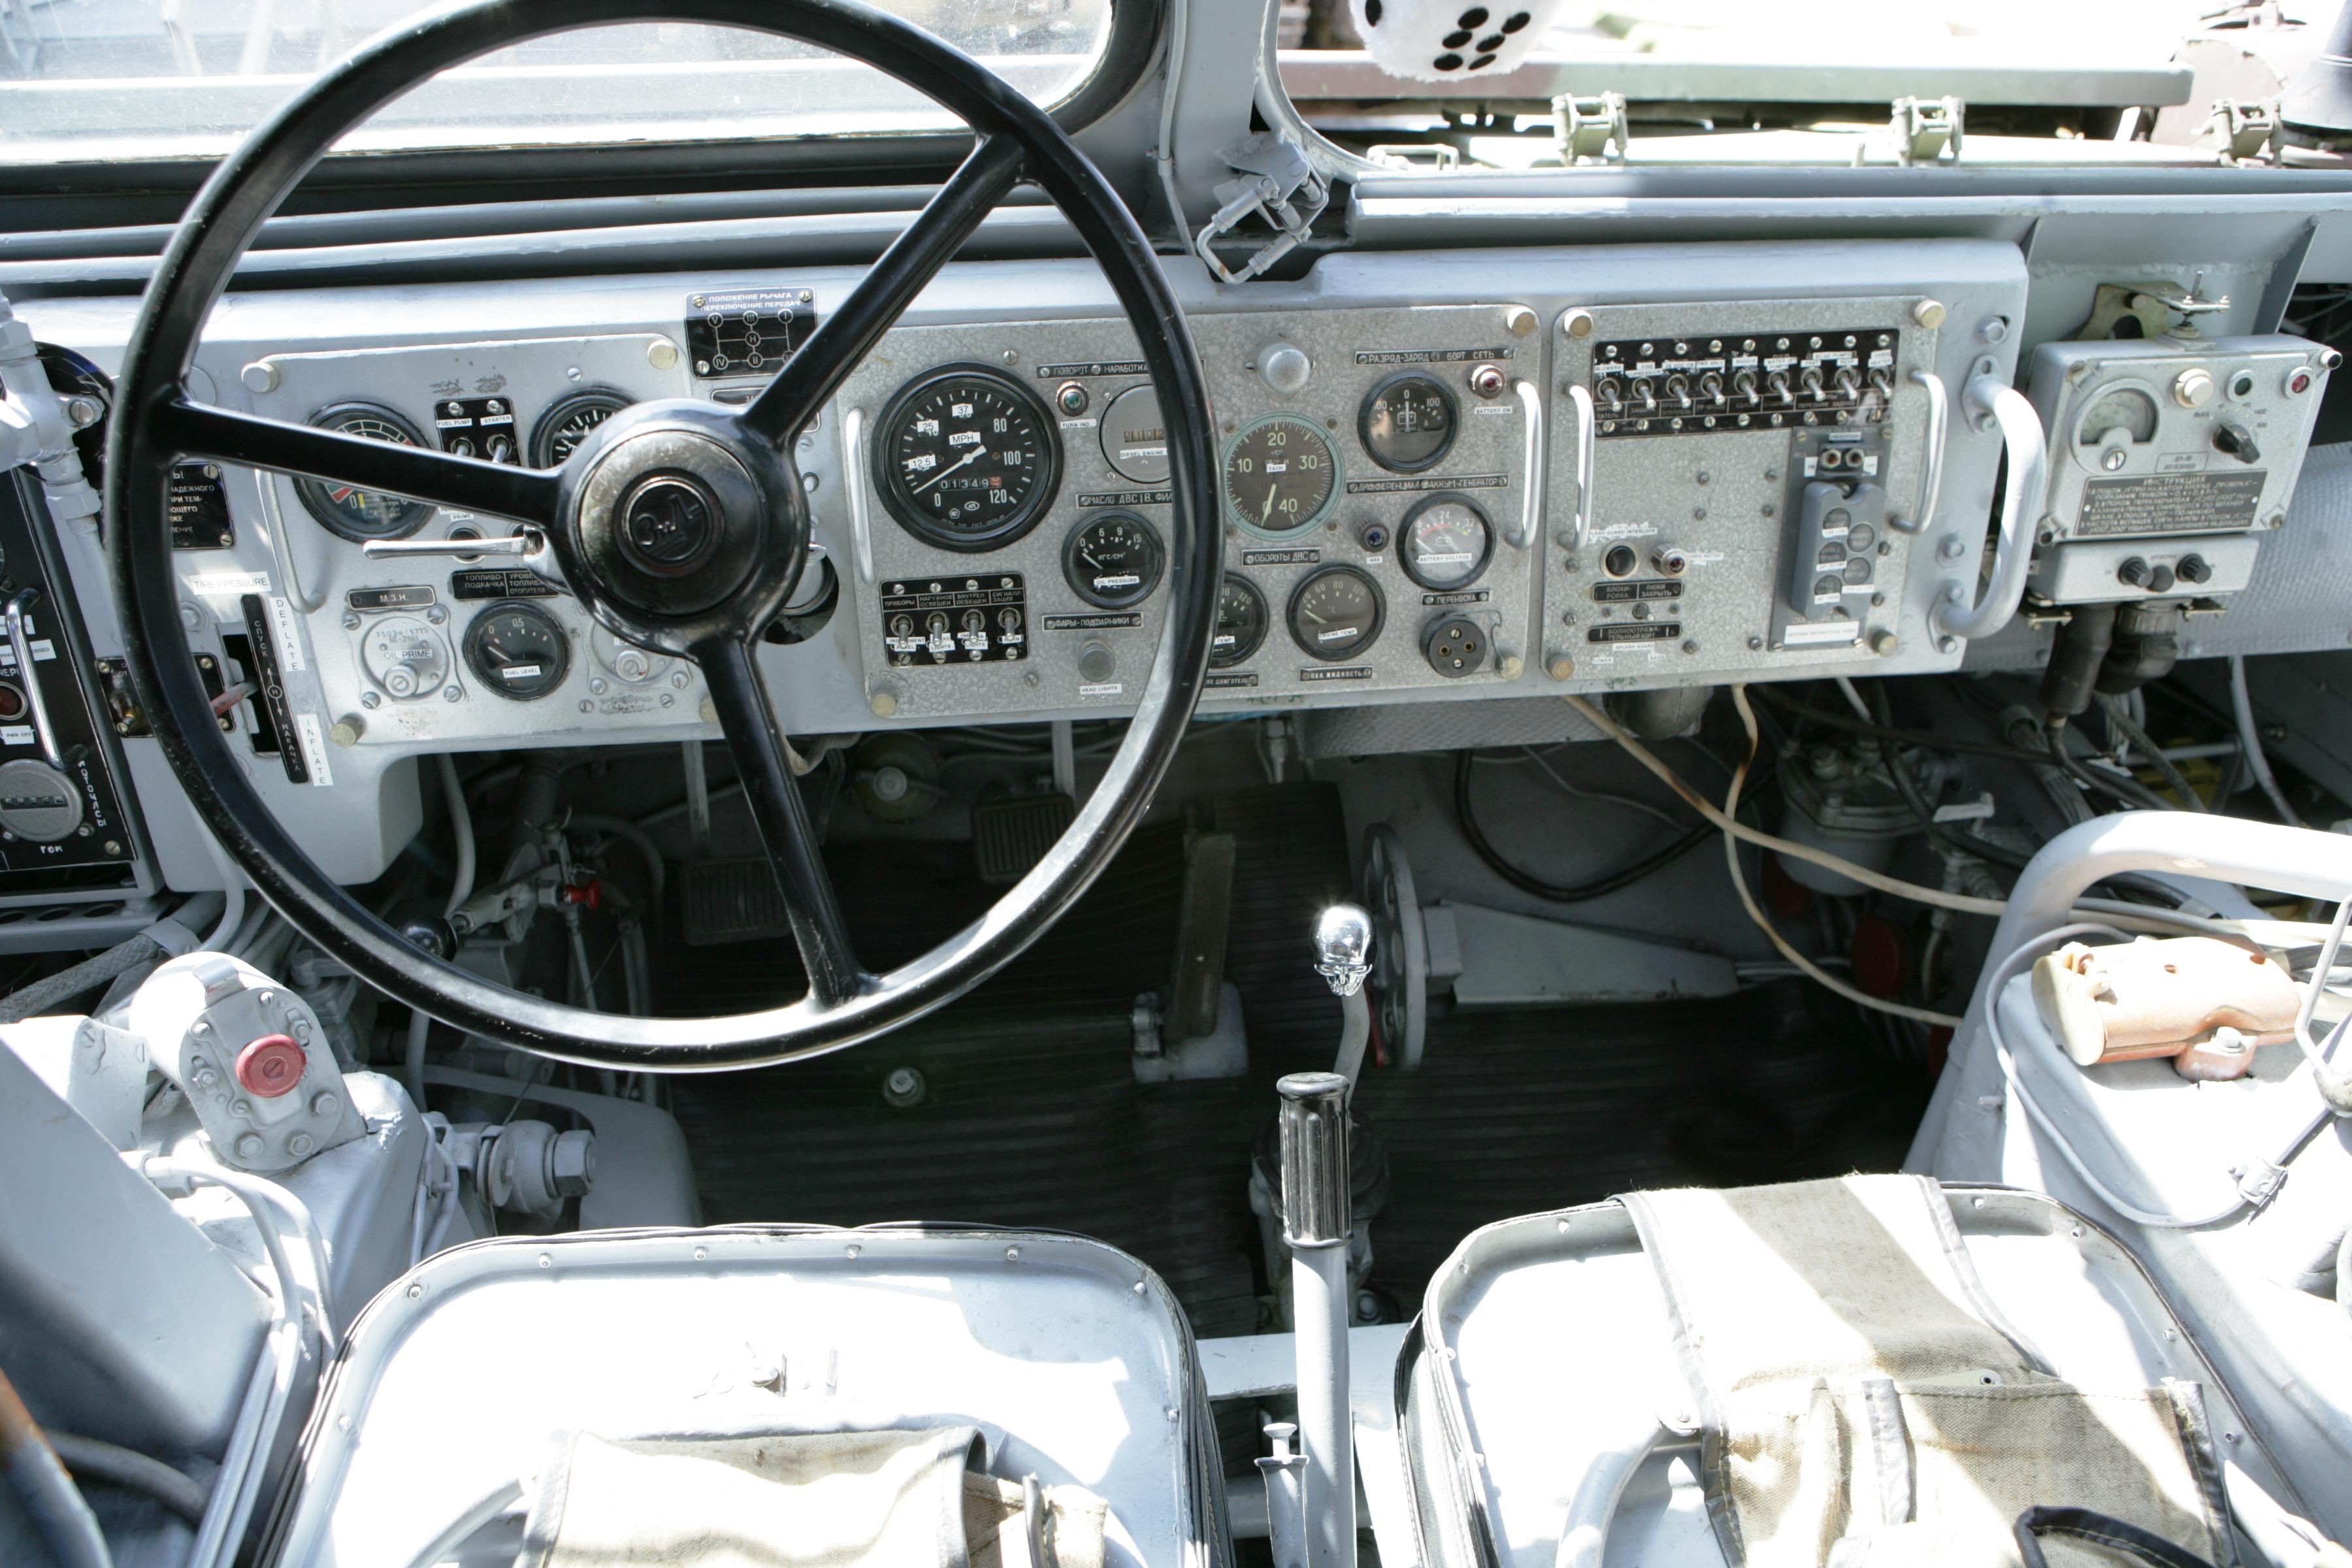 File:9K33 Osa BAZ TEL steering wheel.JPG - Wikimedia Commons